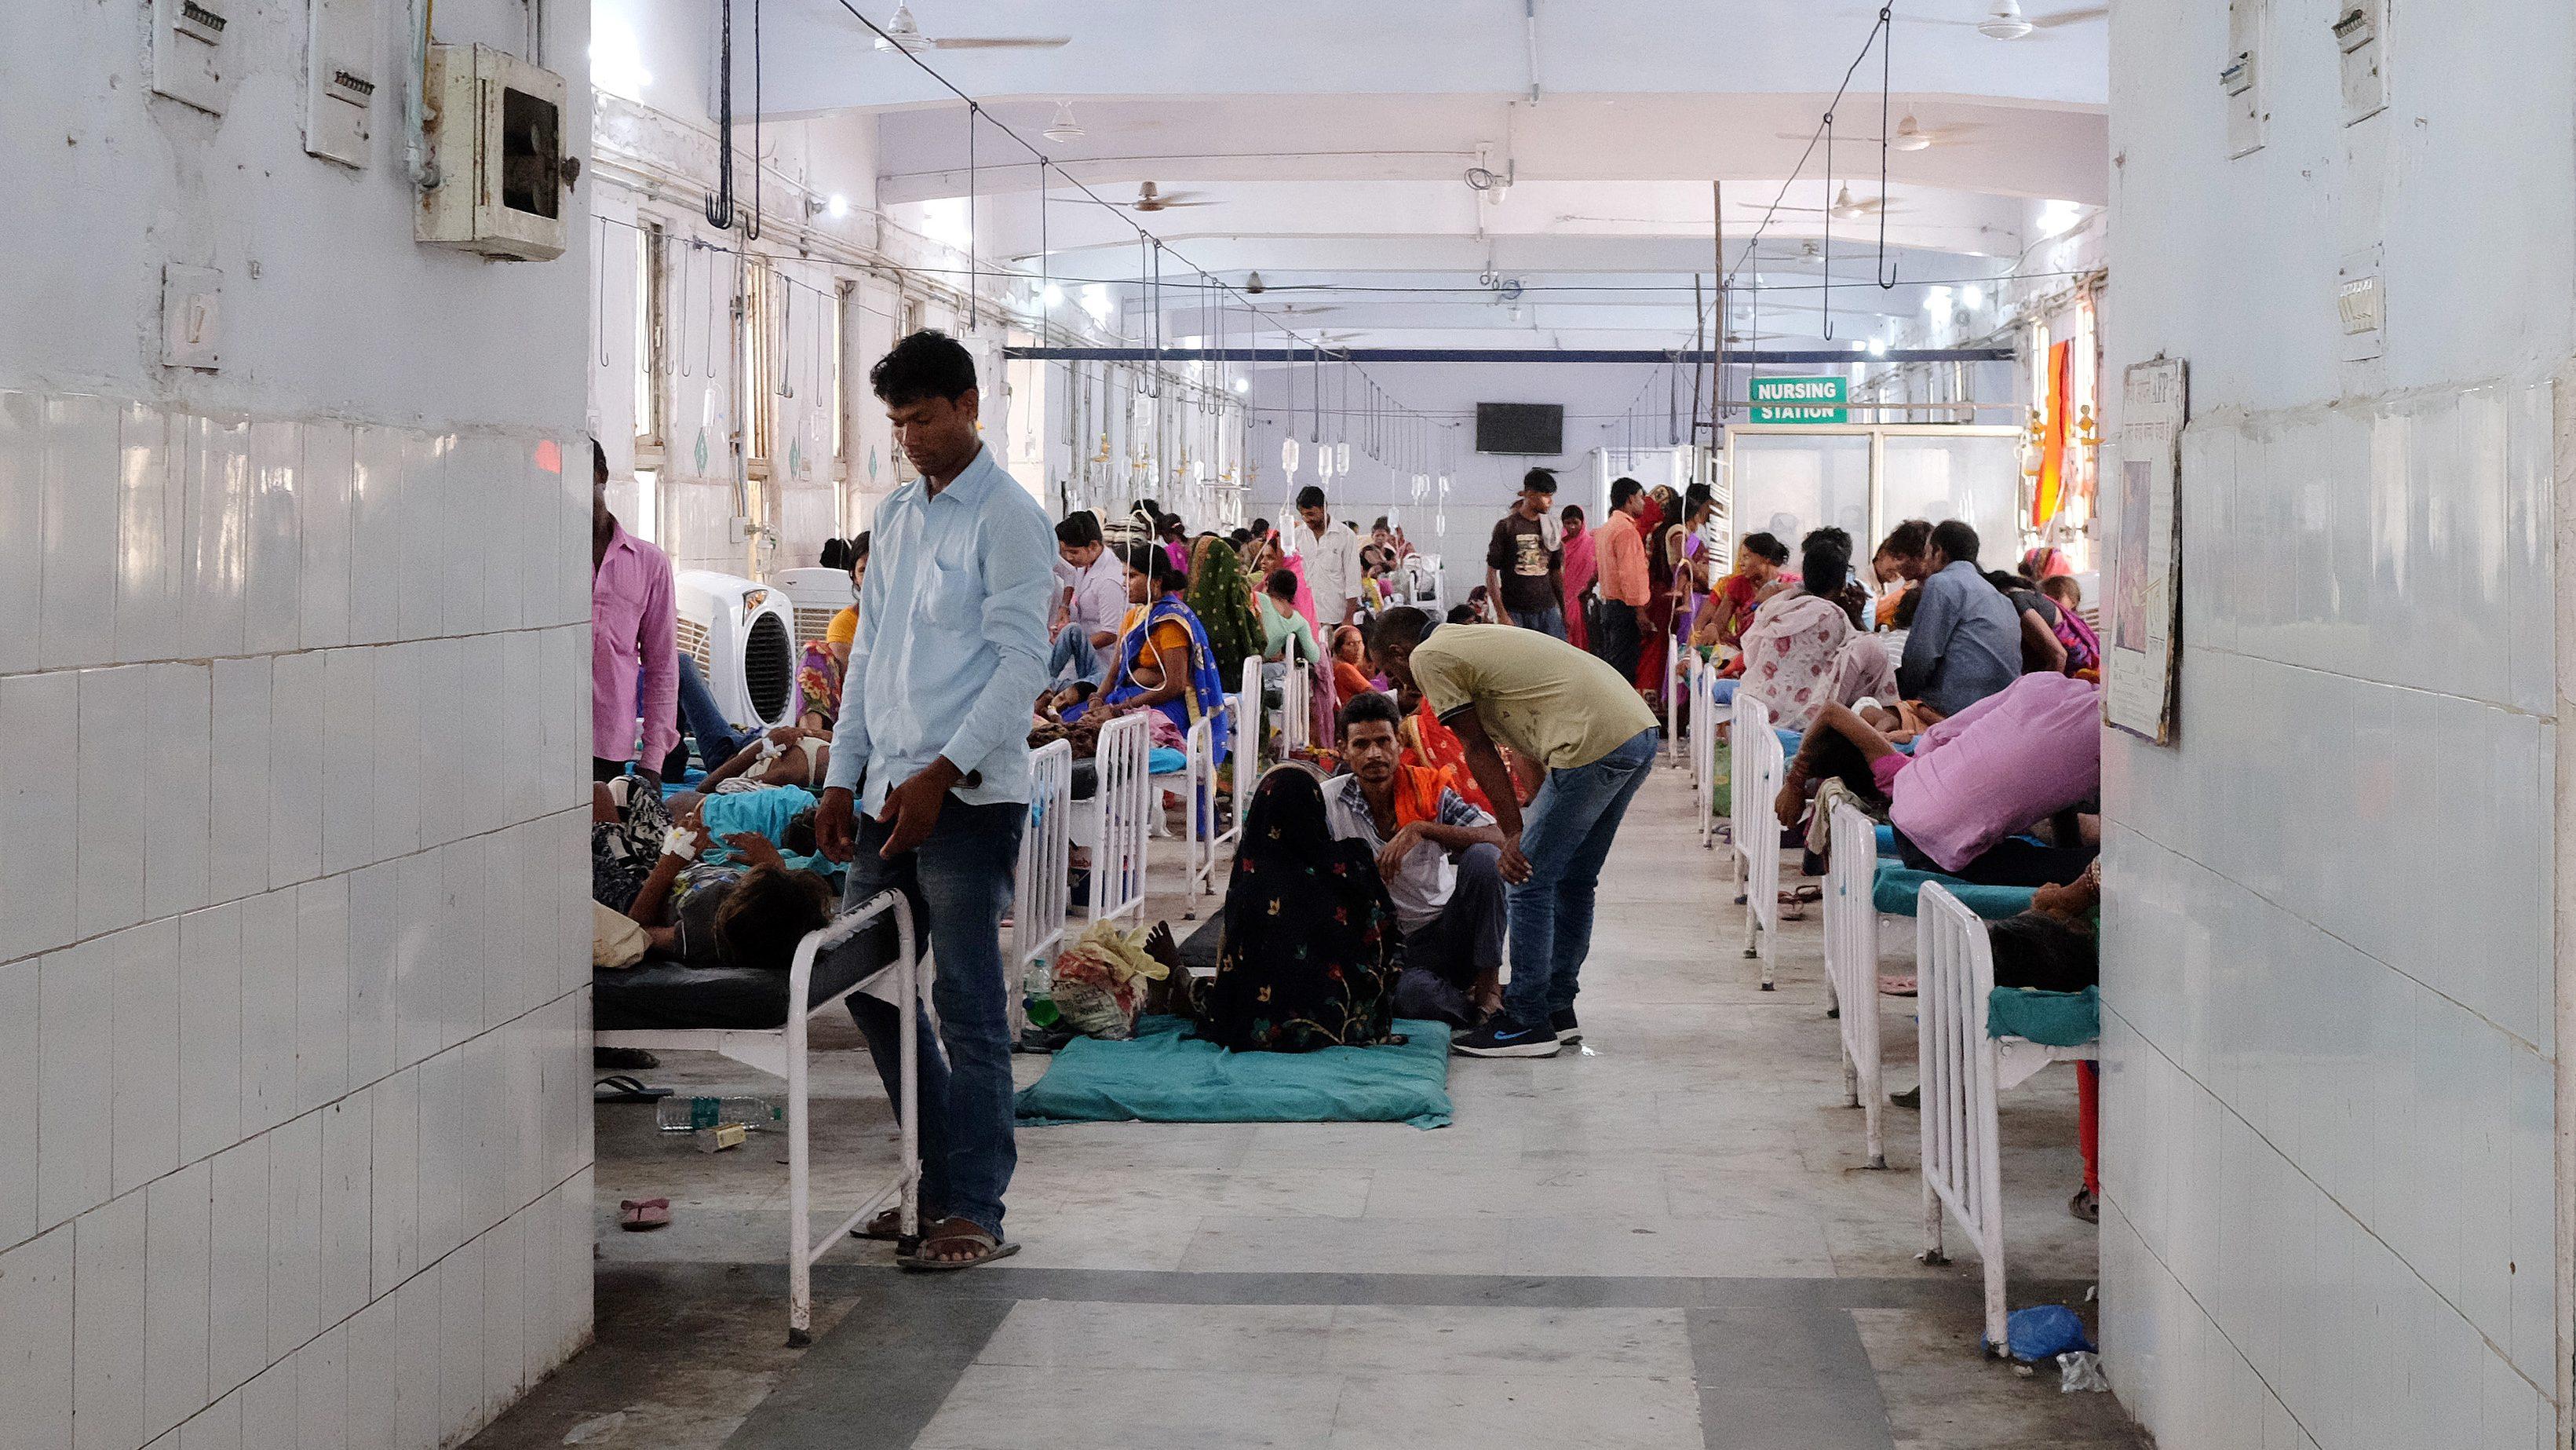 Superbugs have returned to haunt India's hospitals